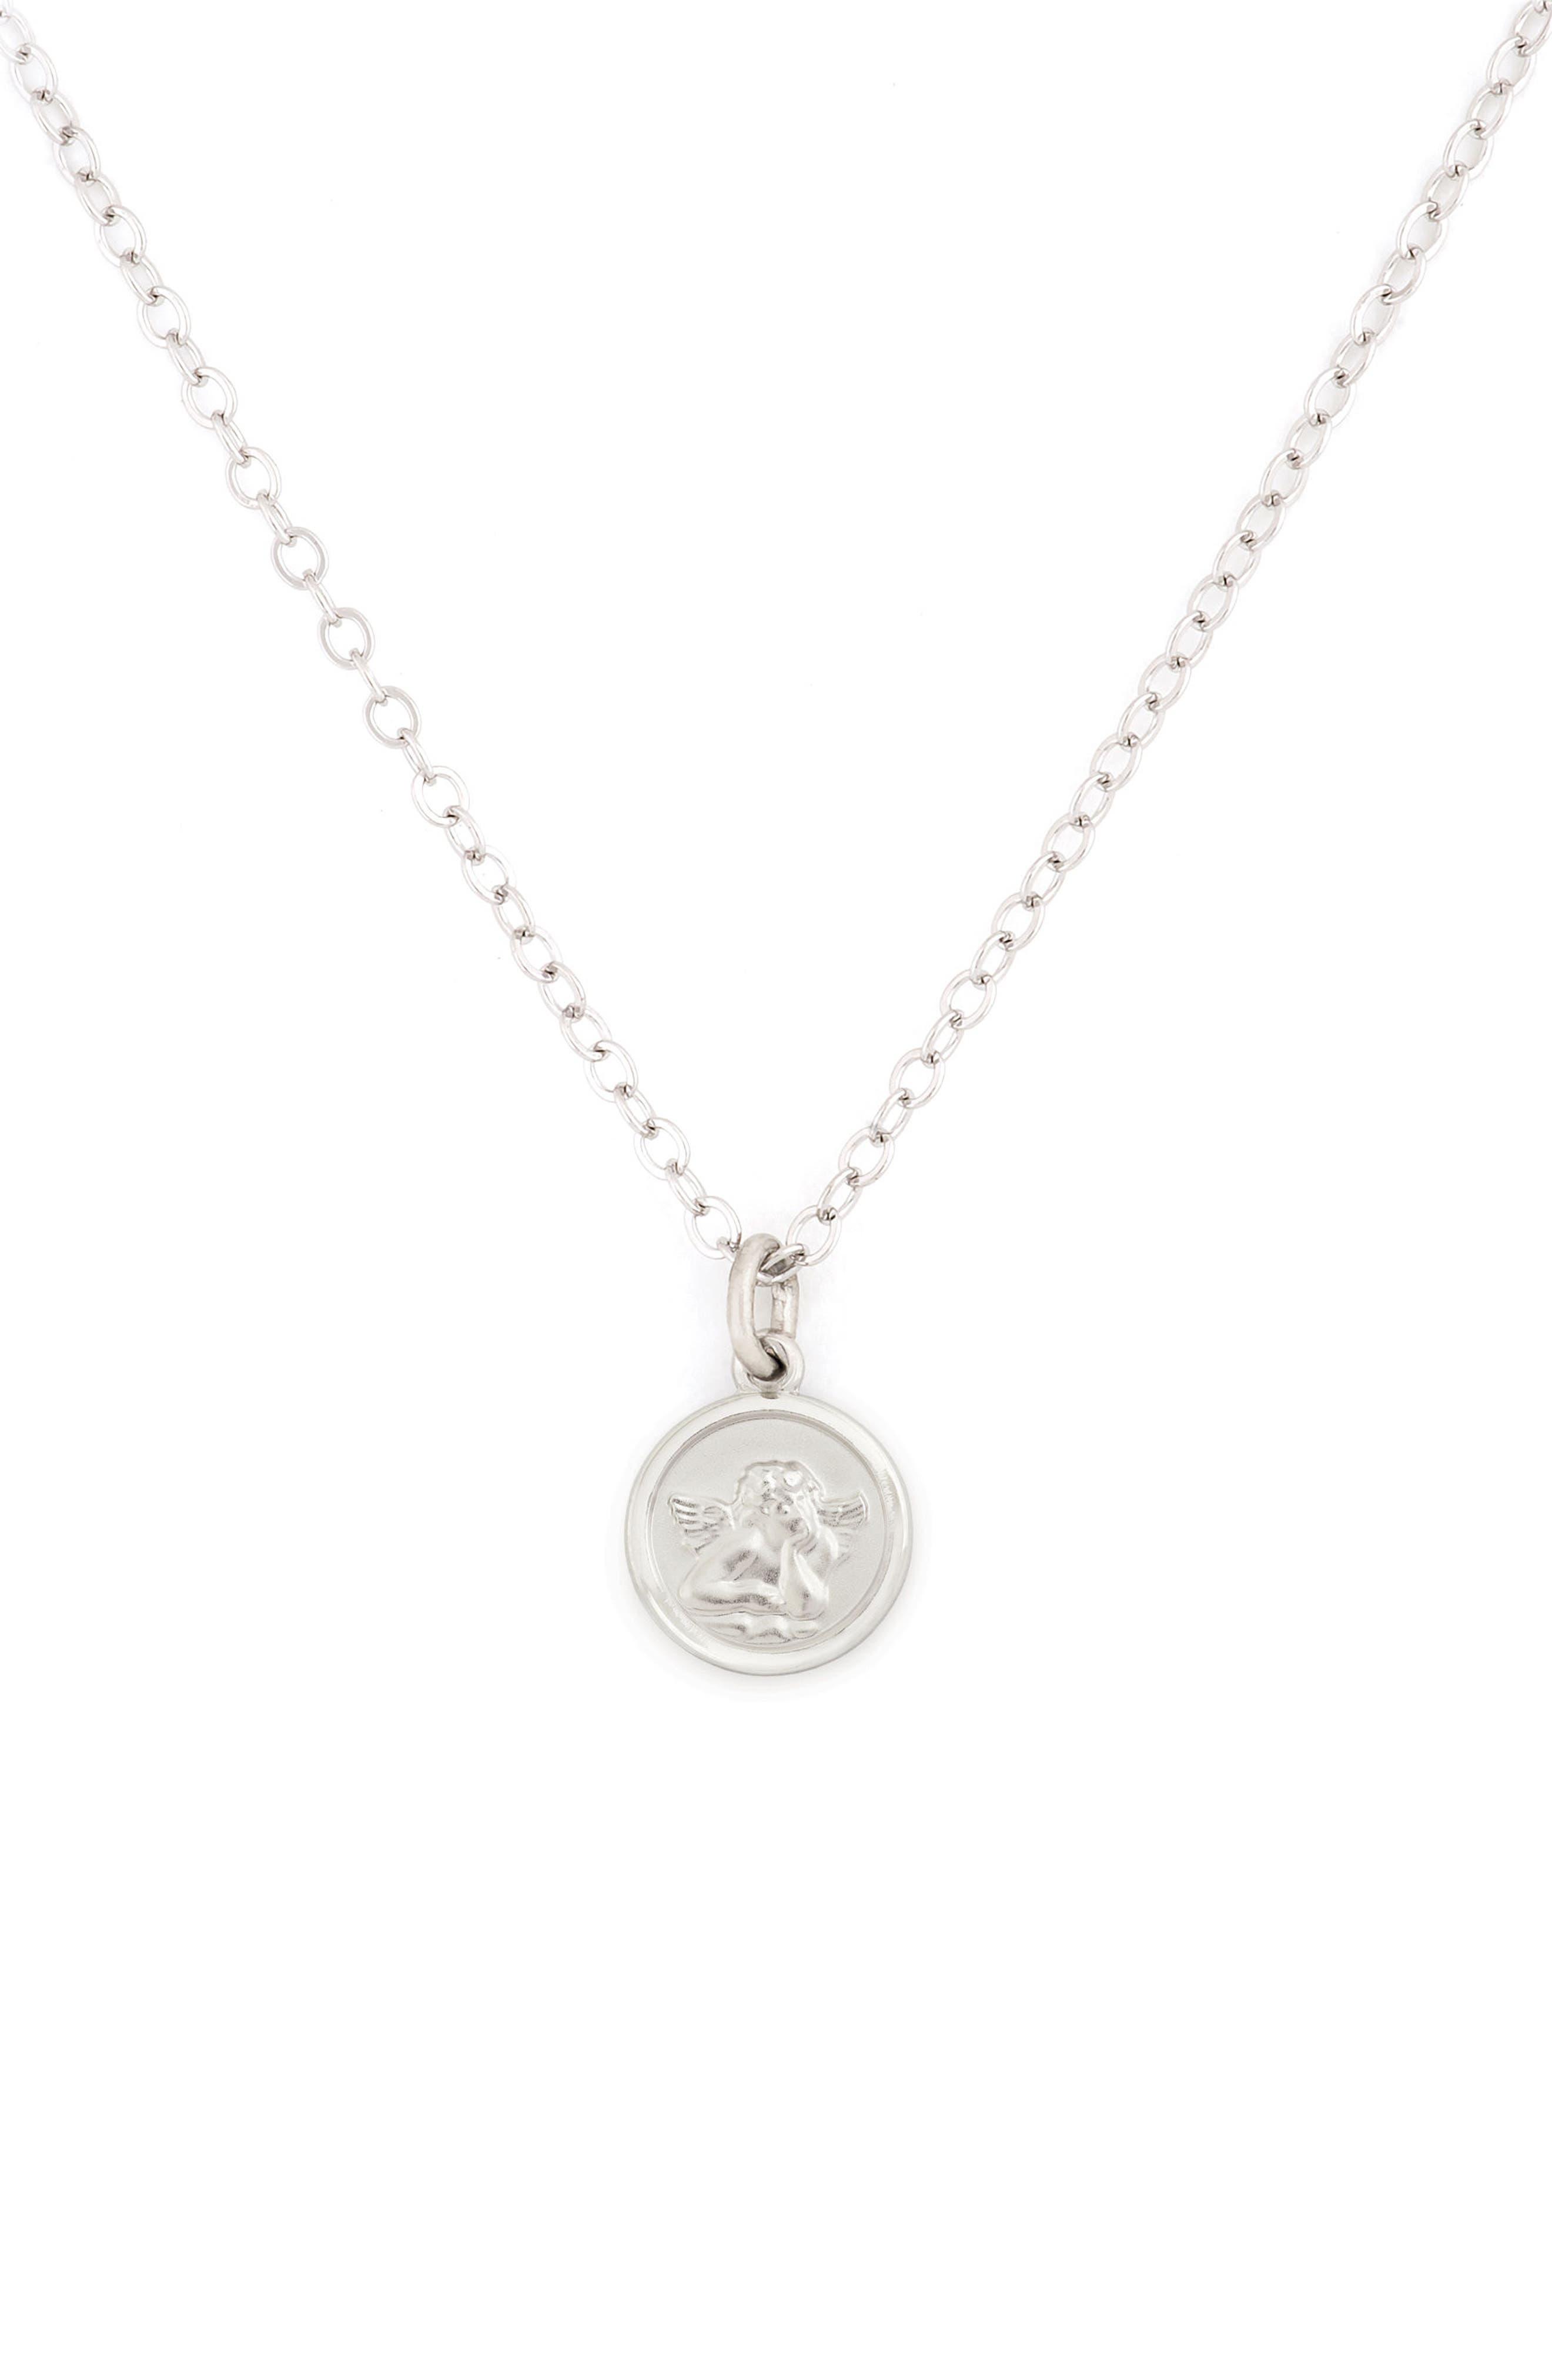 Cherub Medal Sterling Silver Pendant Necklace,                         Main,                         color, 040